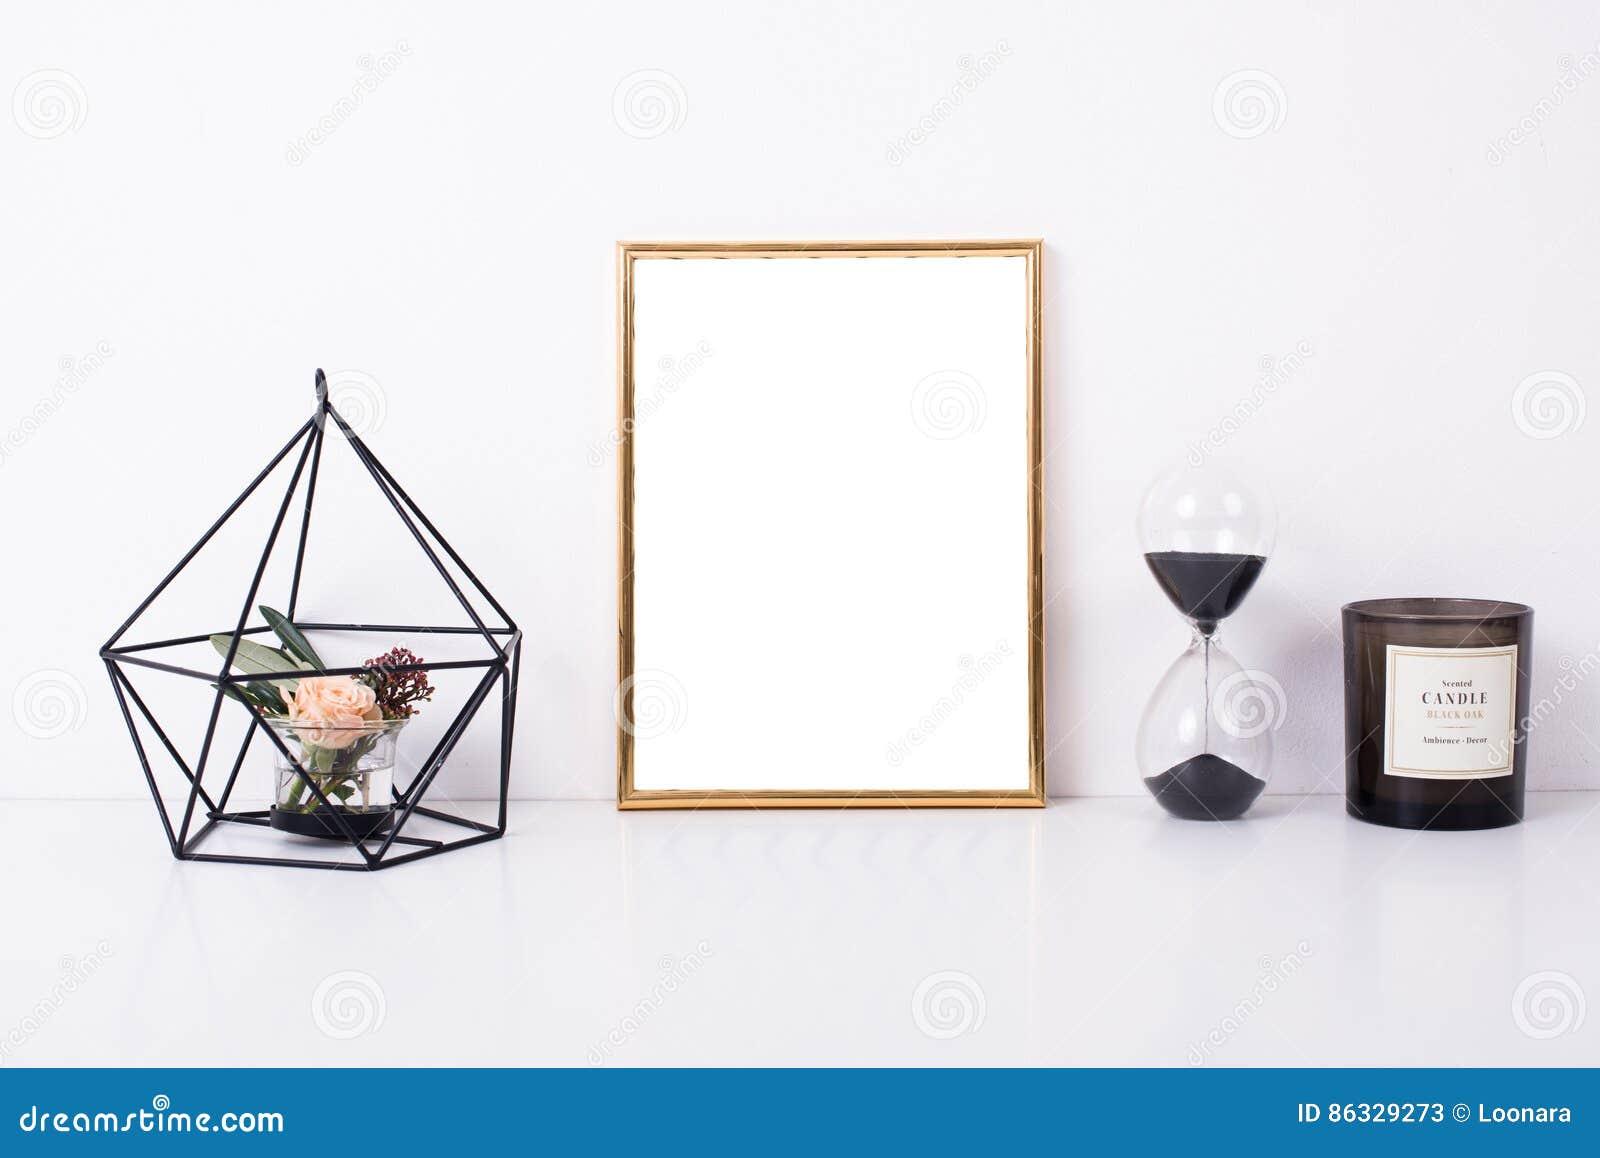 Modelo dourado do quadro na parede branca